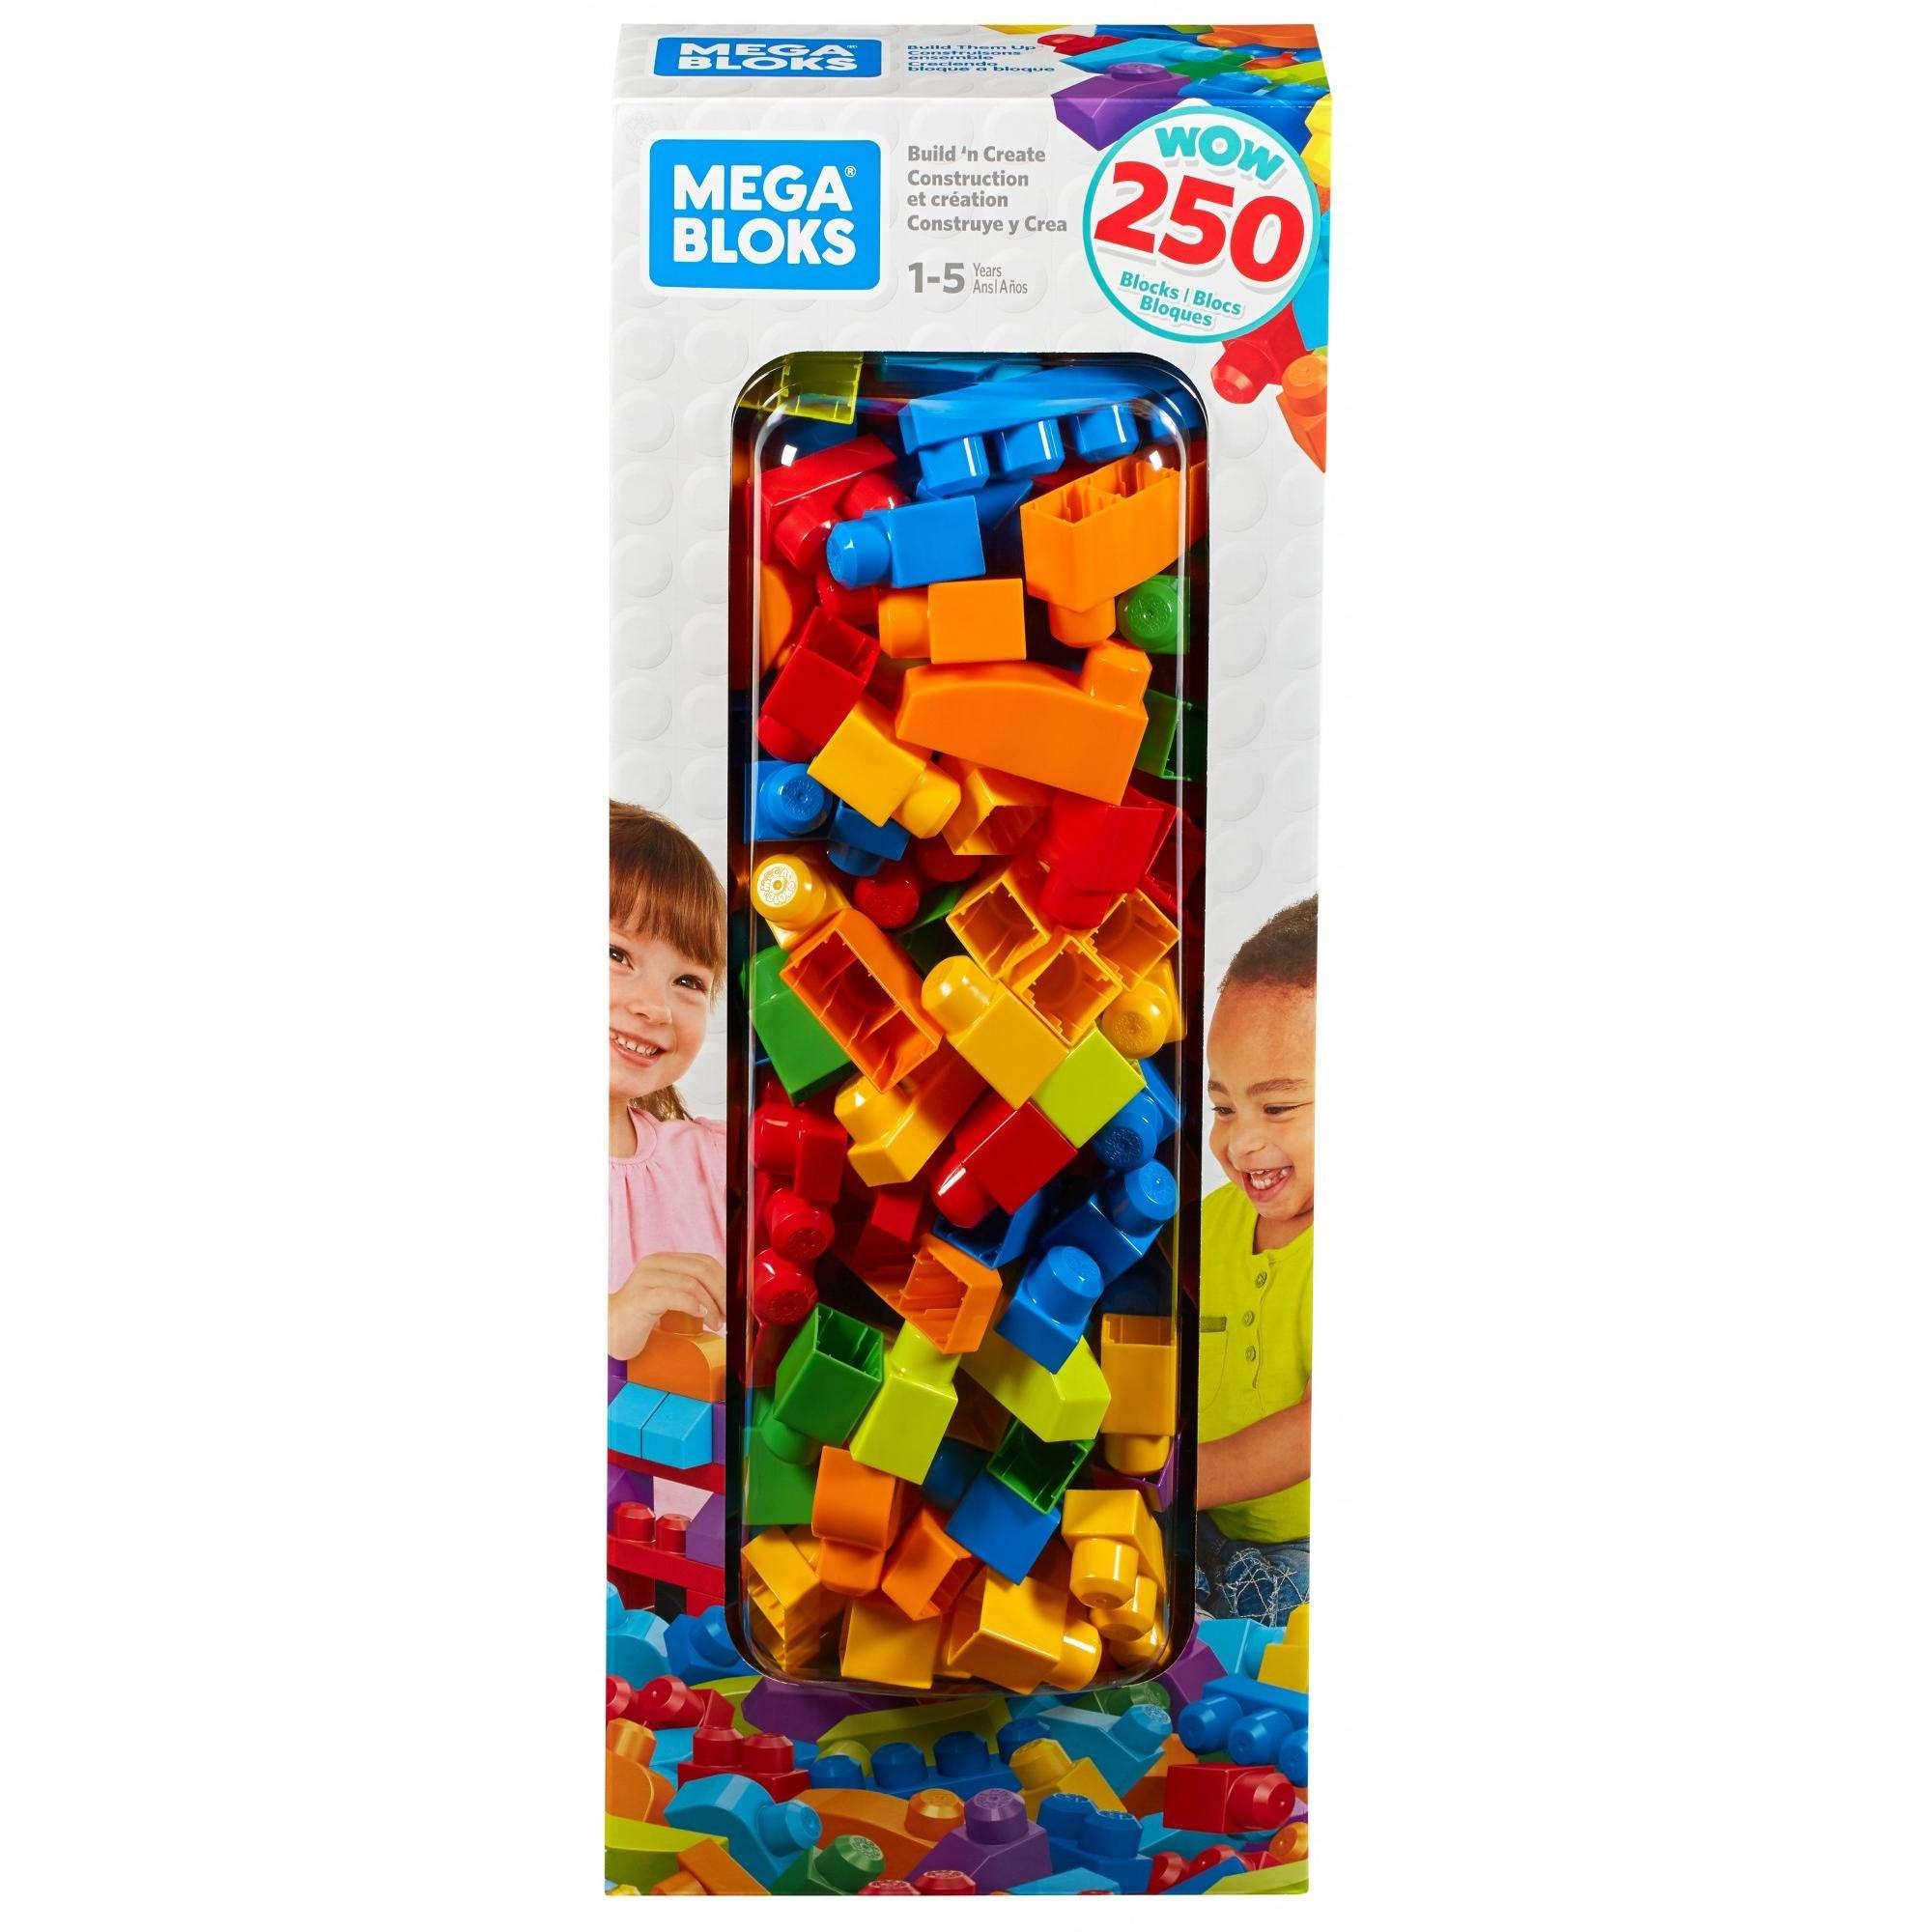 250-Piece Mega Bloks Big Builders Build 'N Create Block Set for Kids $20 + Free Store Pickup at Walmart